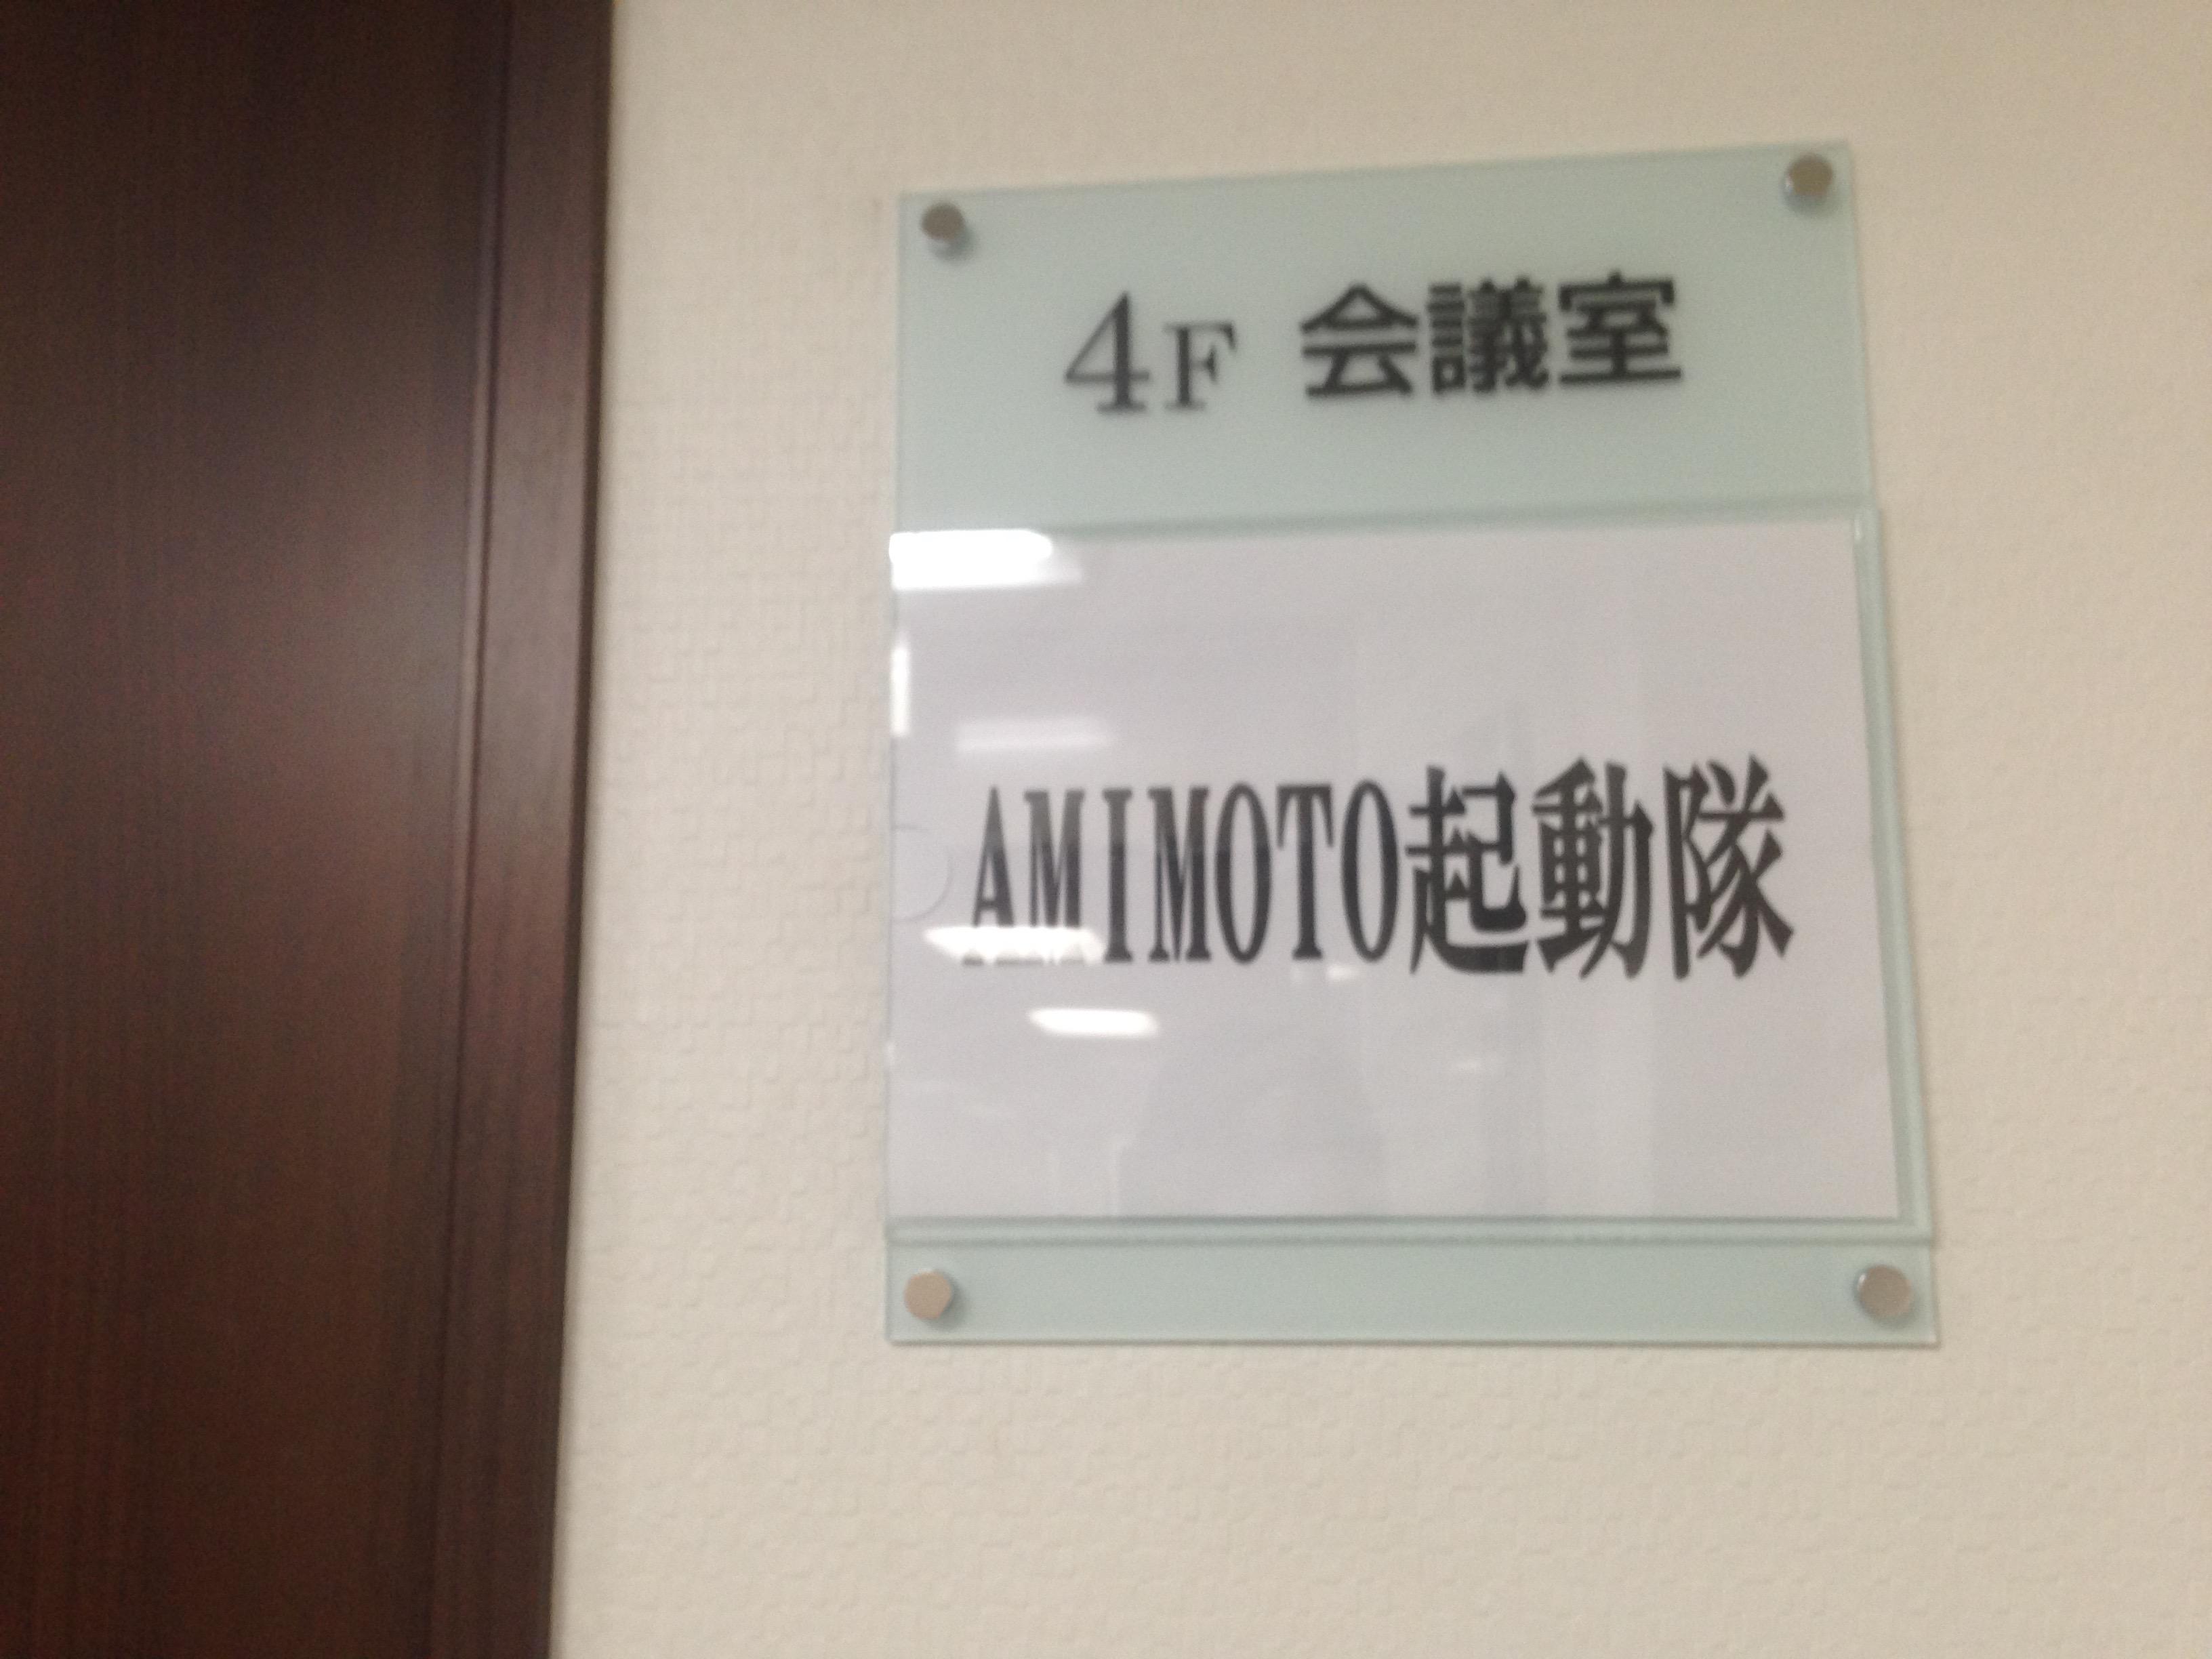 AMIMOTO 起動隊 アドバンスド シリーズ in 山形/仙台 の個人報告